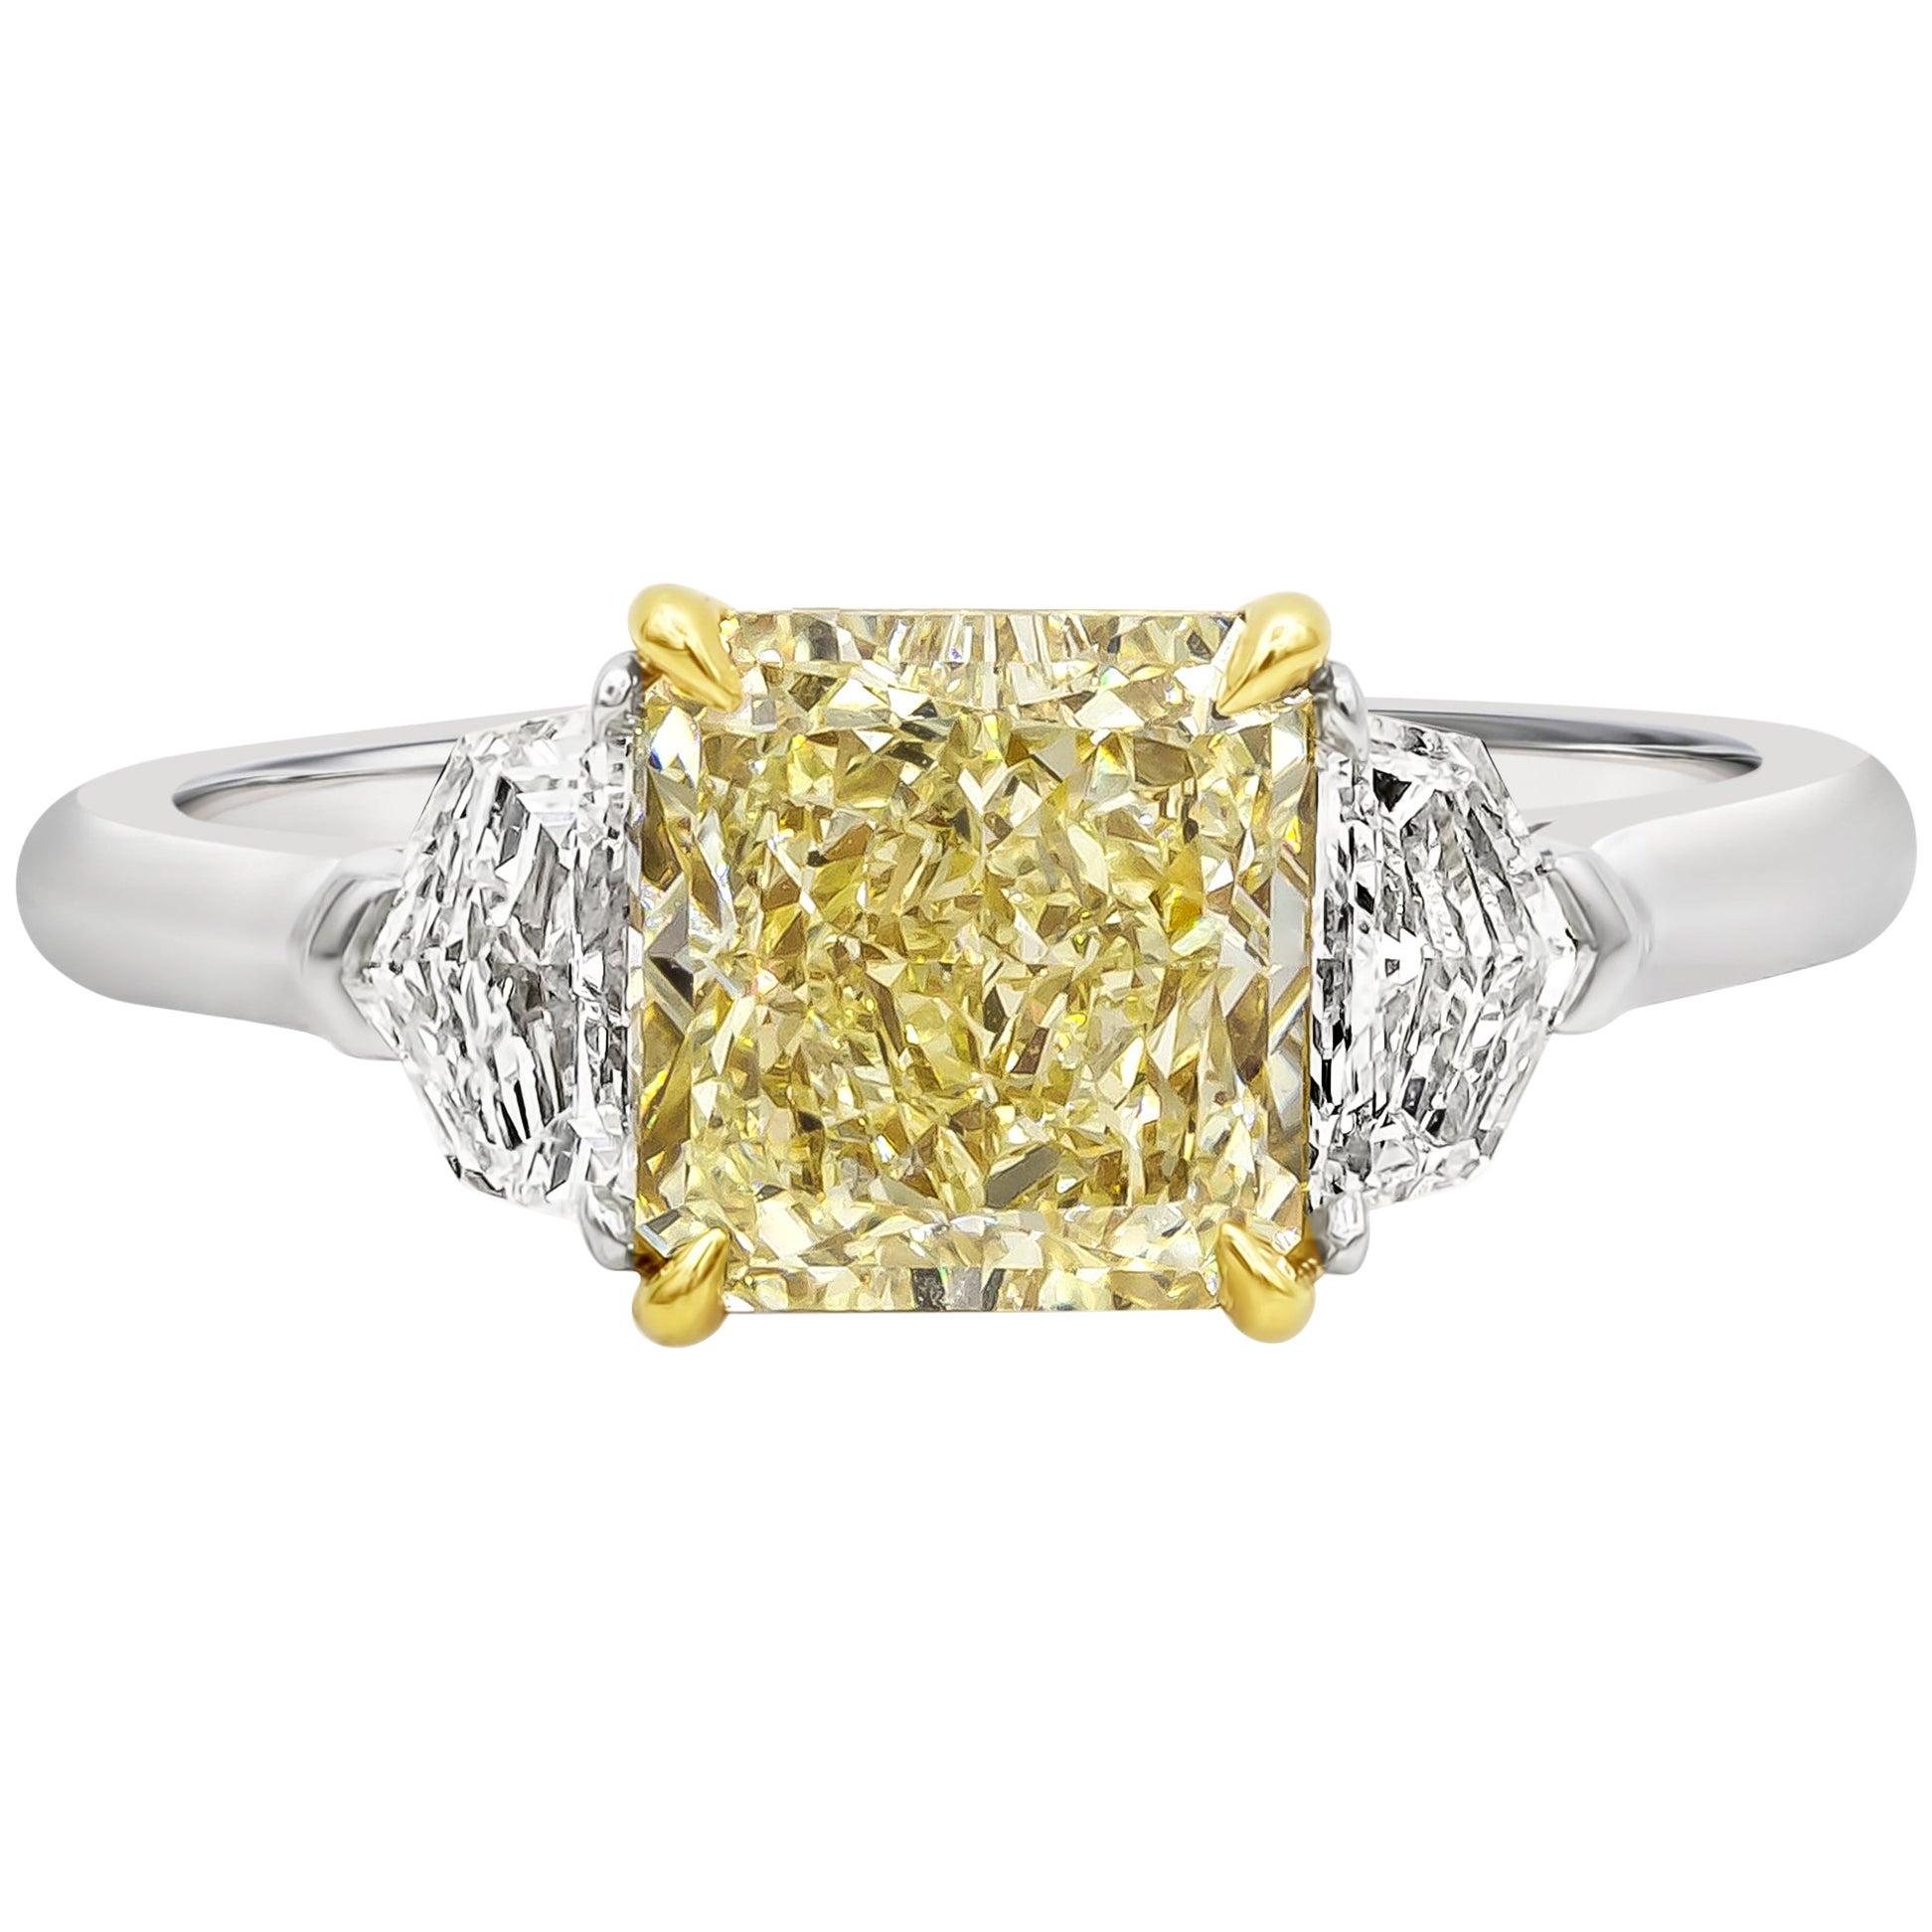 GIA Certified 2.01 Carat Yellow Diamond Three-Stone Engagement Ring